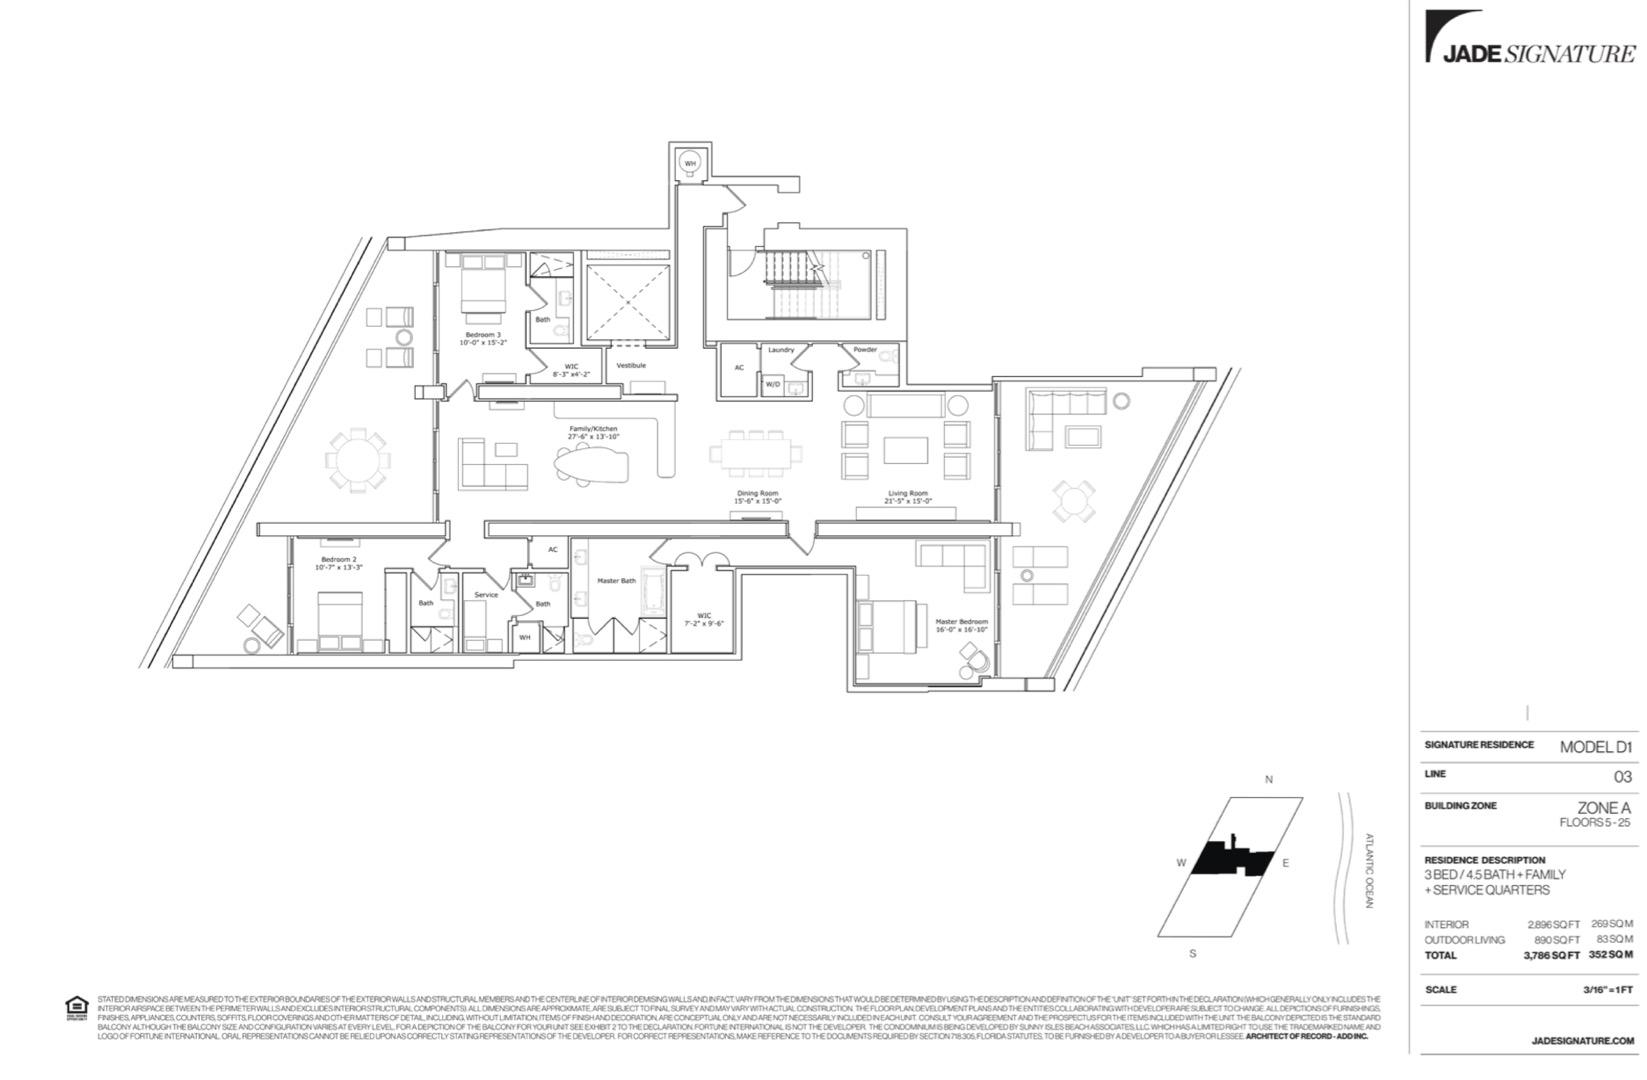 Floor plan image D1 - 3/4.5/FamilyRoom/ServiceQuarters  - 2896 sqft image